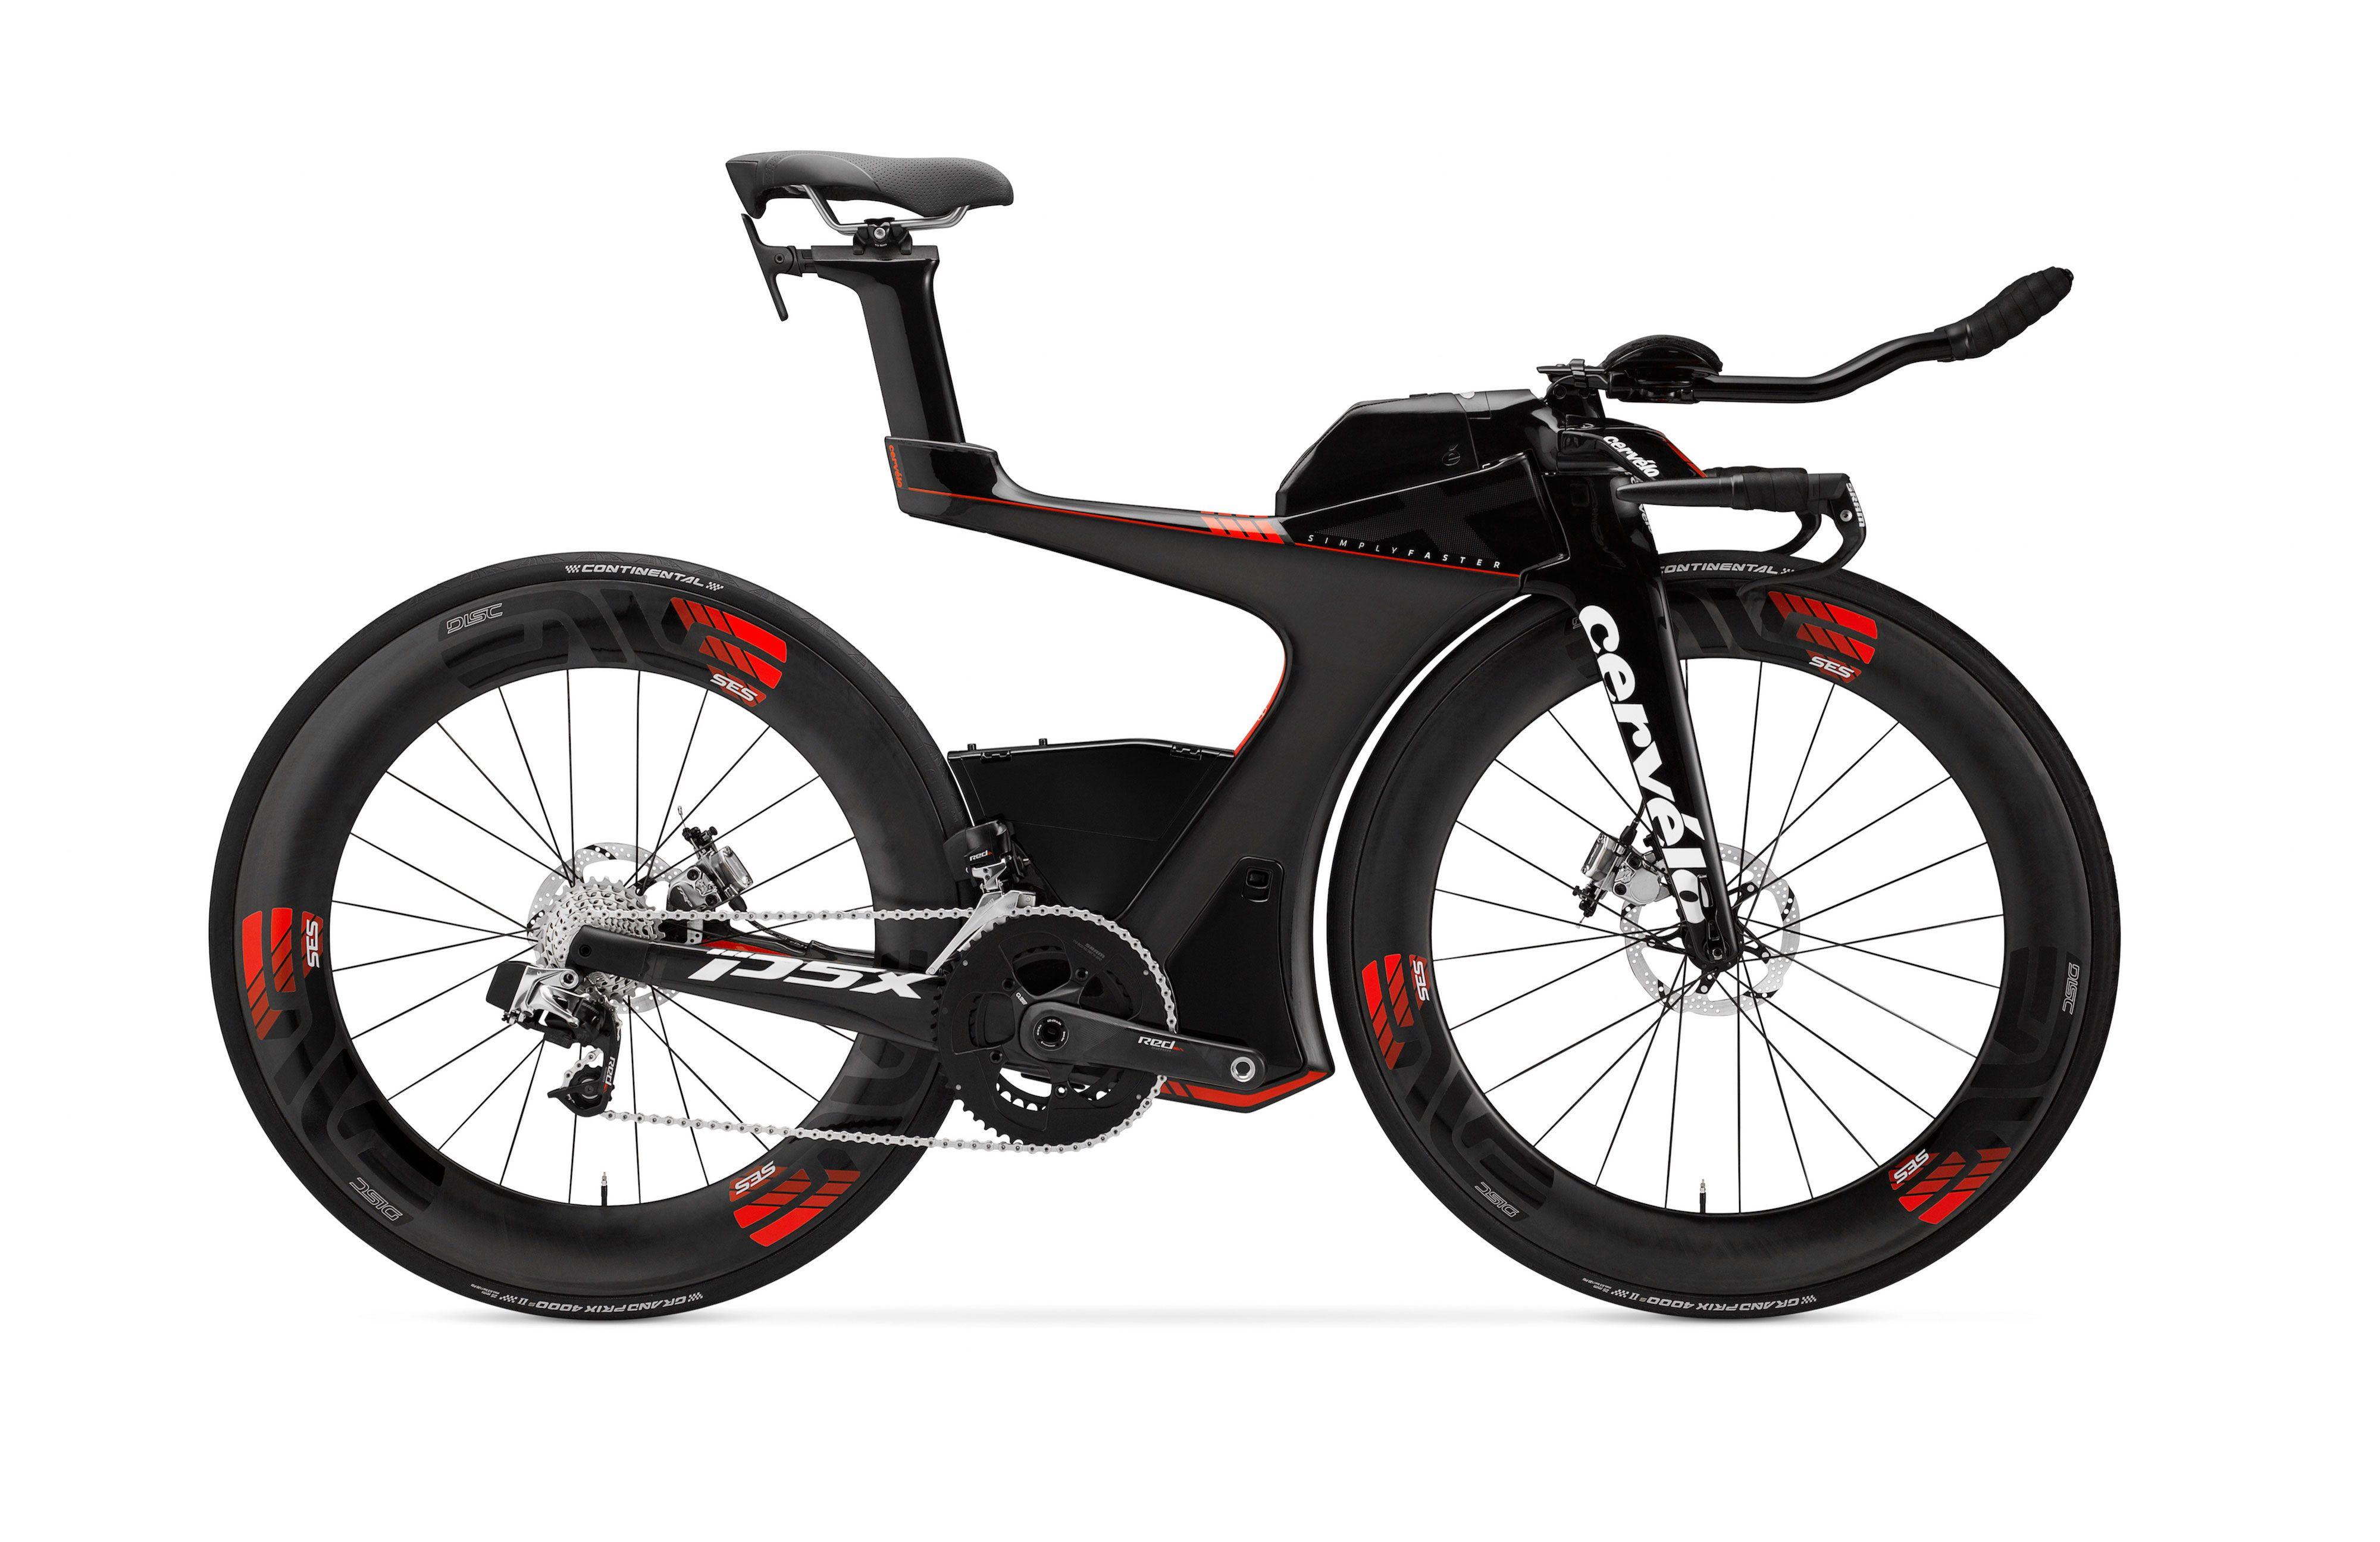 The 11 000 Bike Designed Just For Triathletes